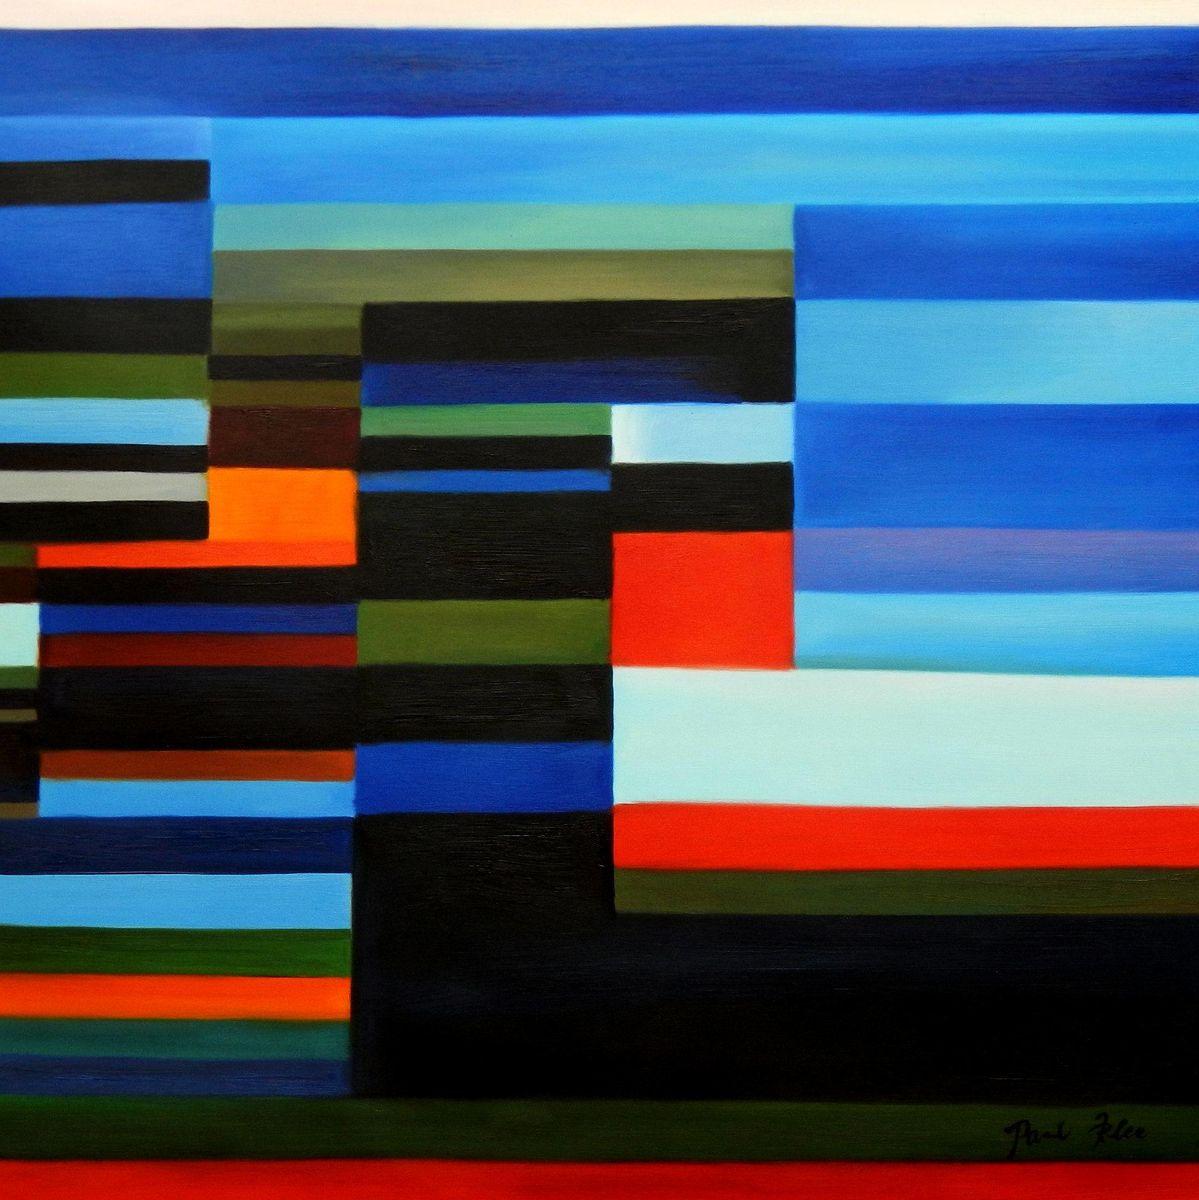 Paul Klee - Feuer am Abend g94669 80x80cm Ölgemälde handgemalt